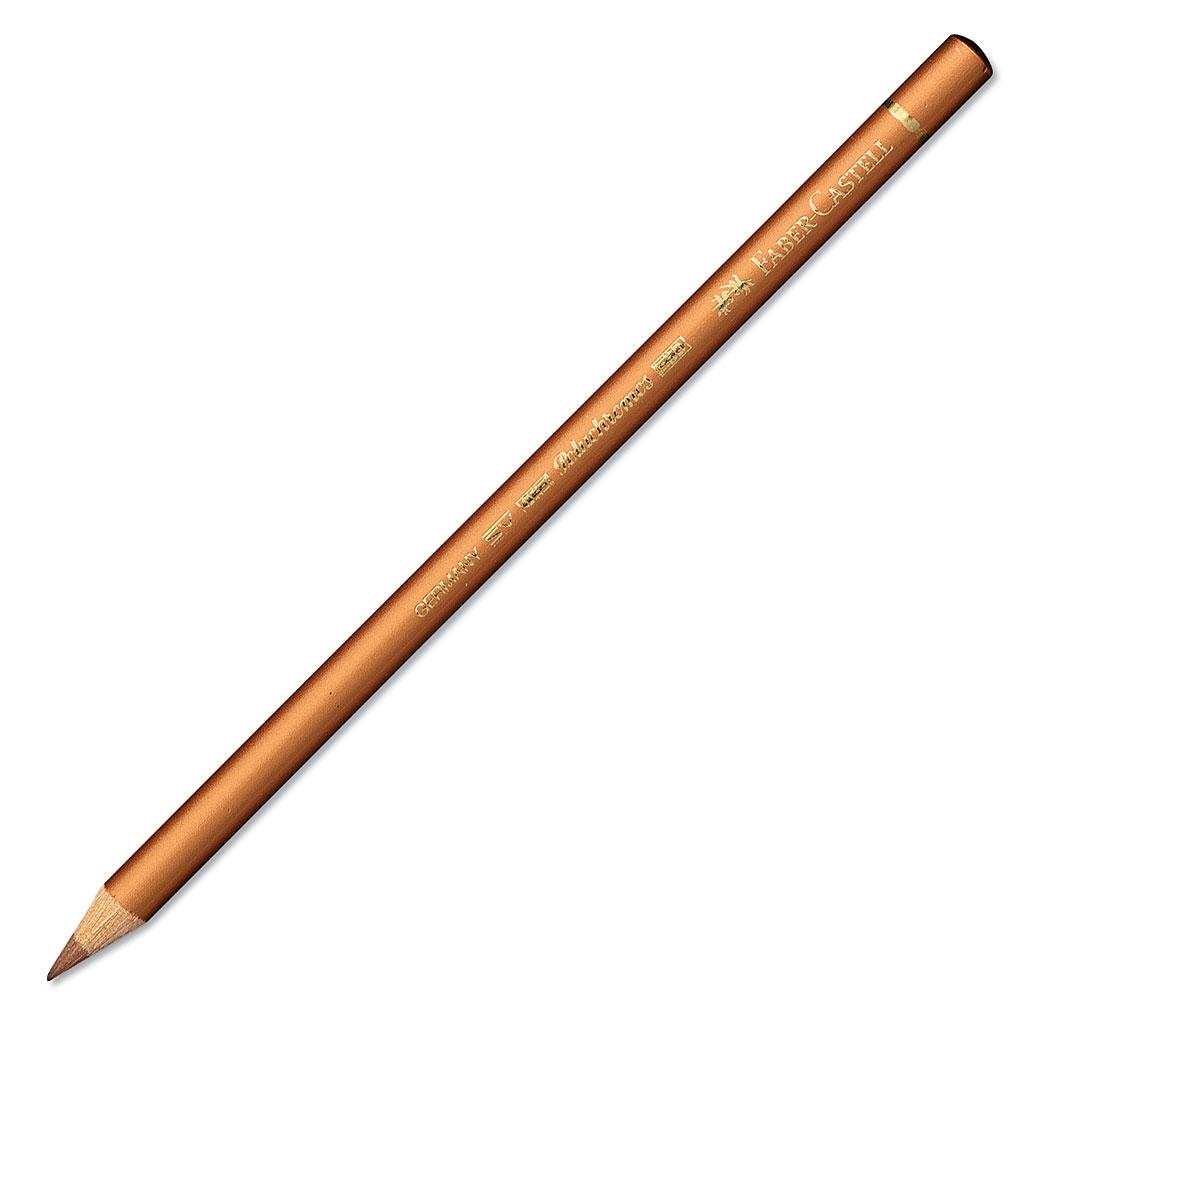 Faber Castell Polychromos Pencil Copper